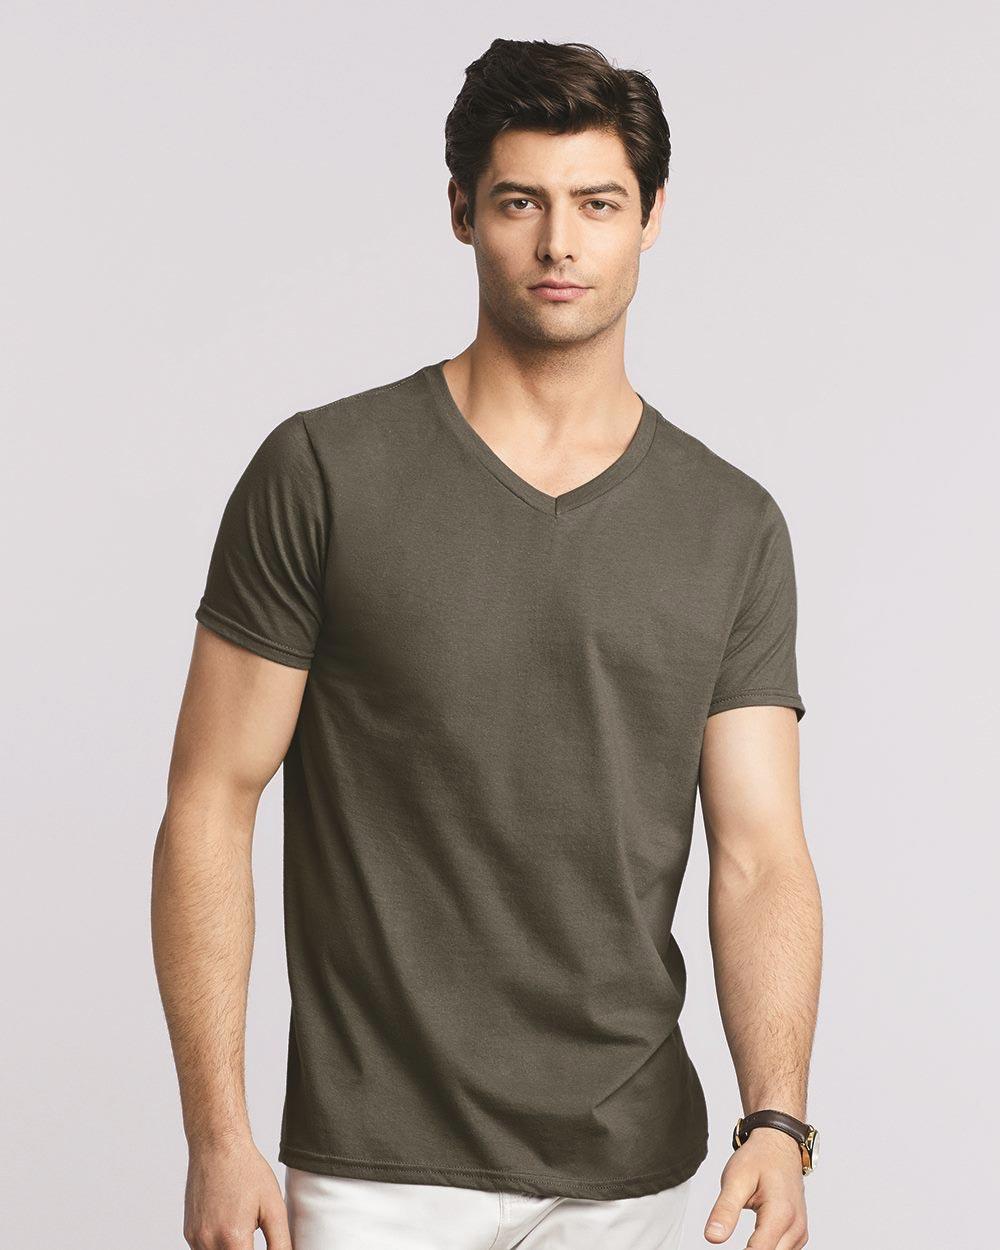 Gildan 64V00 - Softsyle V-Neck T-Shirt